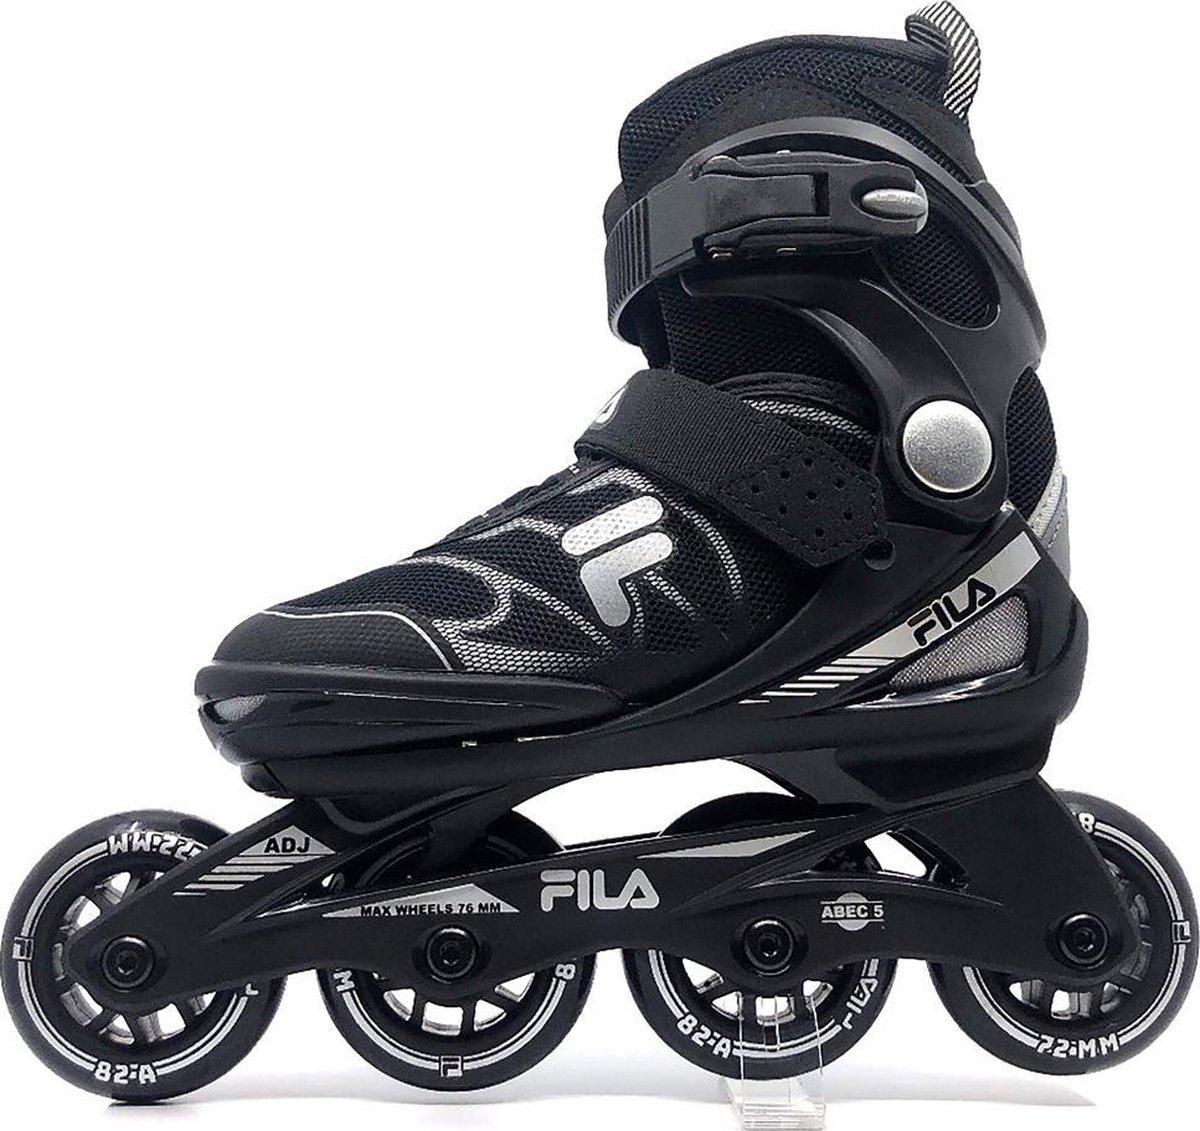 Fila - Verstelbare inline skates - J one - 21' - Maat 32-36 - Zwart - Grijs